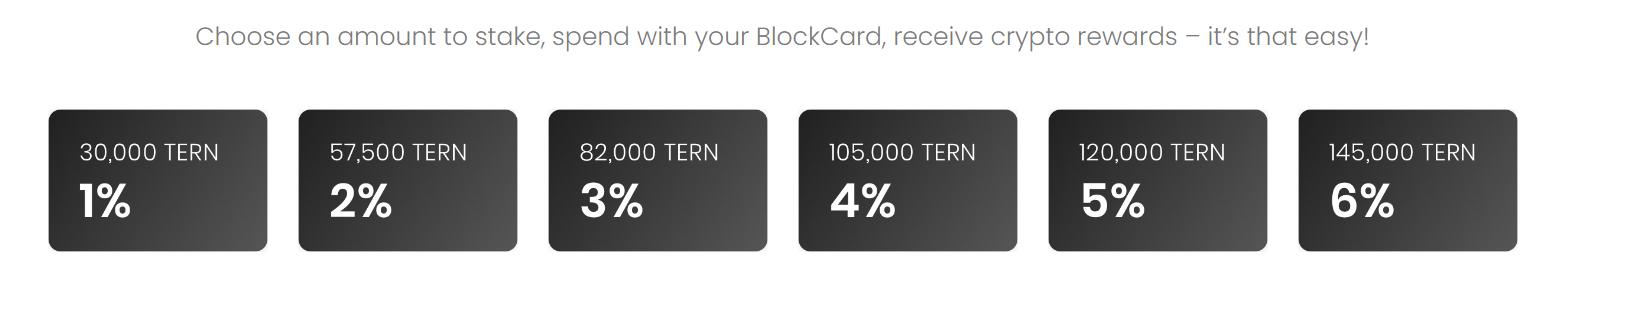 blockcard rewards